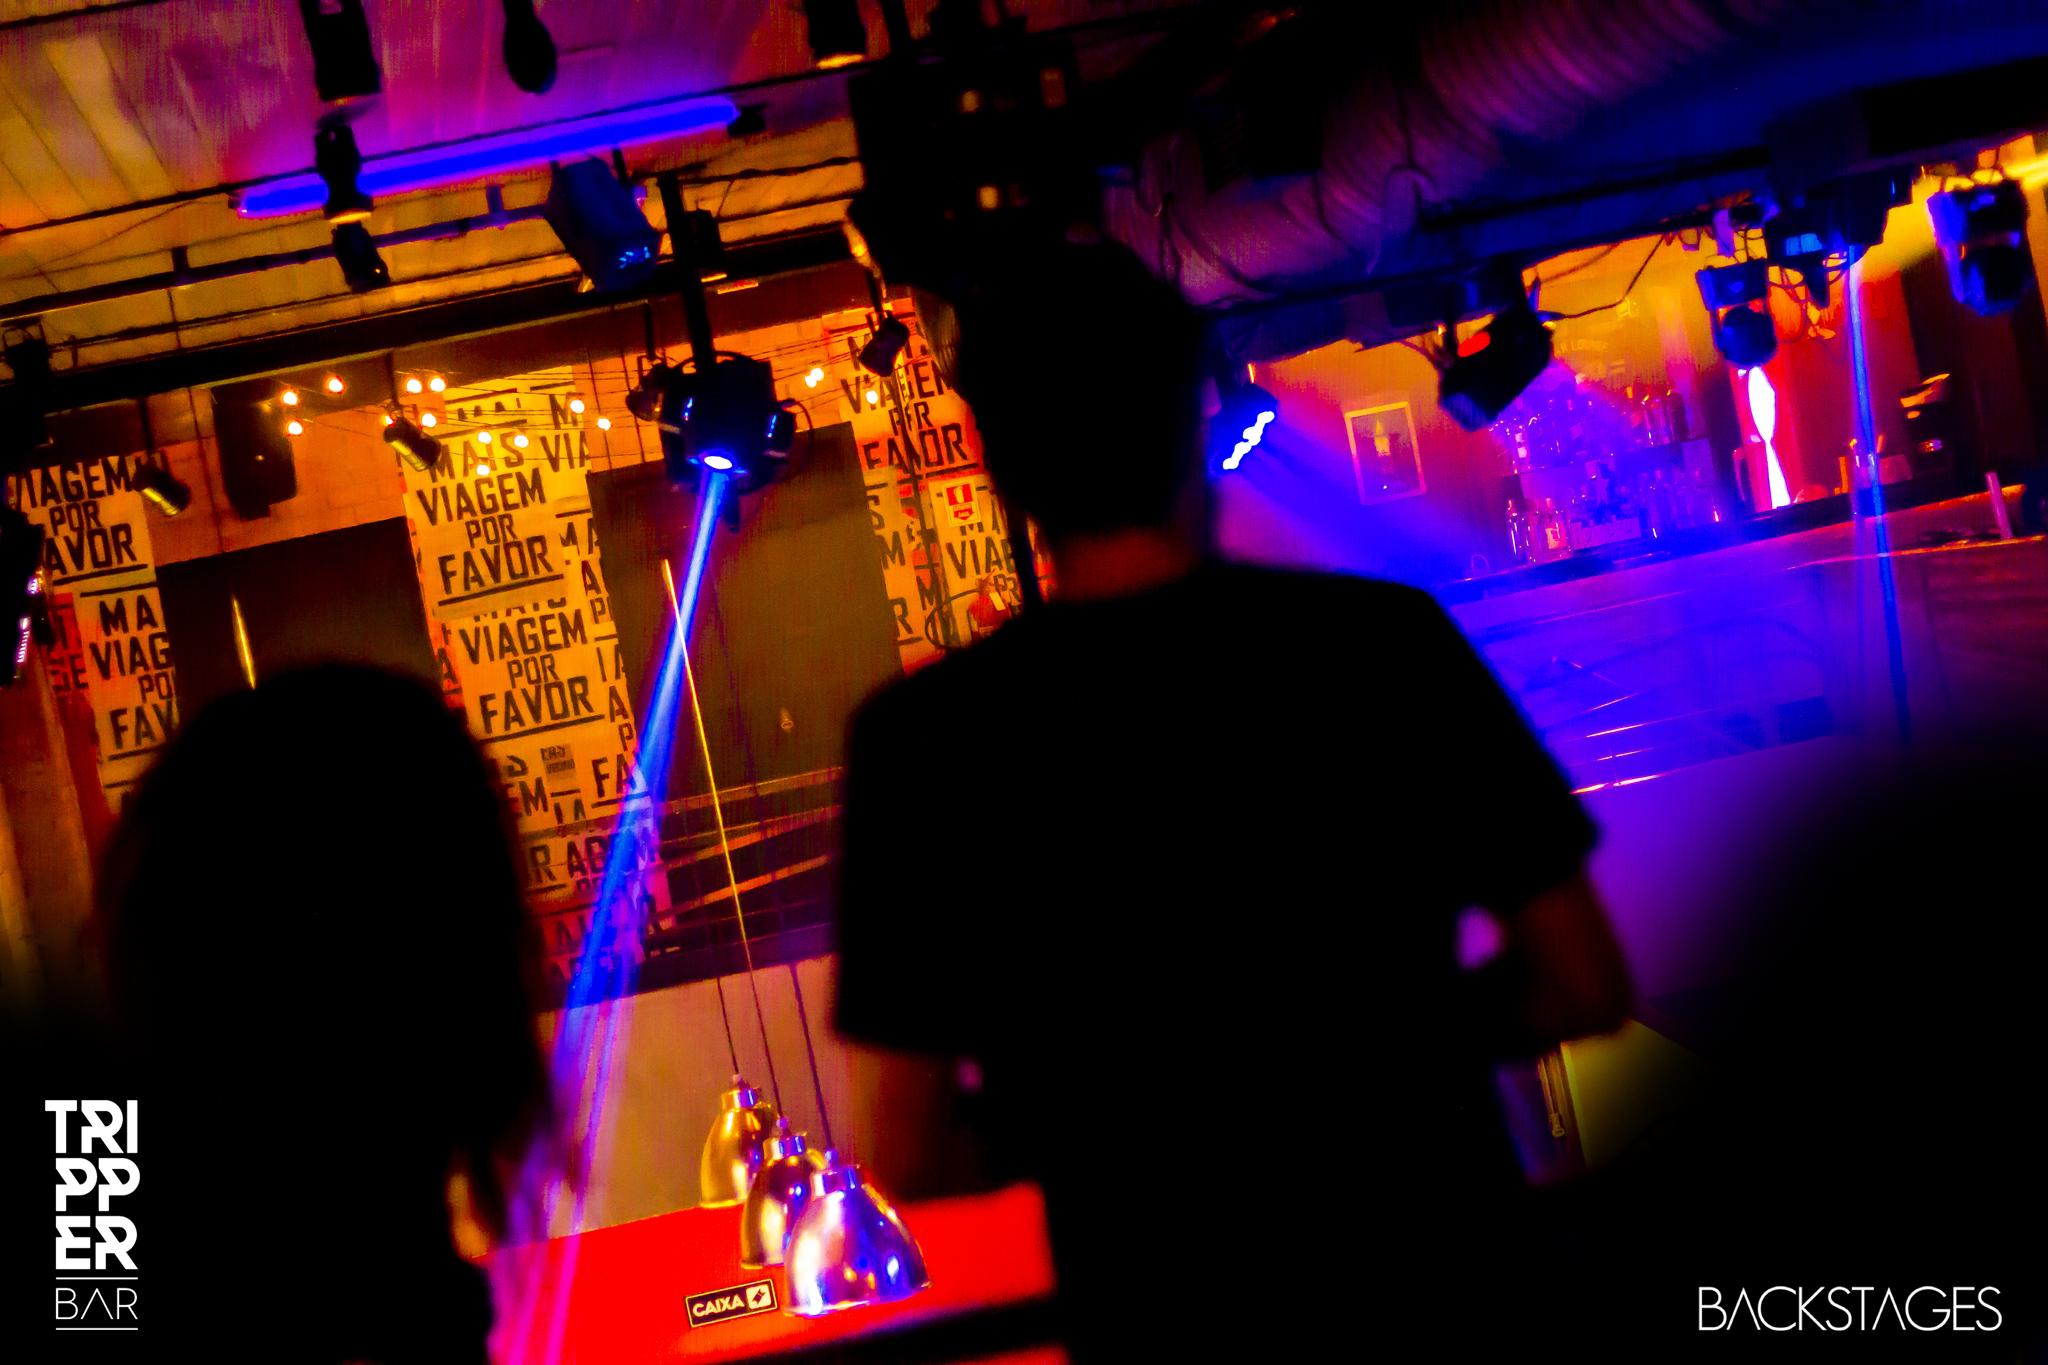 tripper-sorocaba-foto-kenzi-marinho-revista-backstages (13)